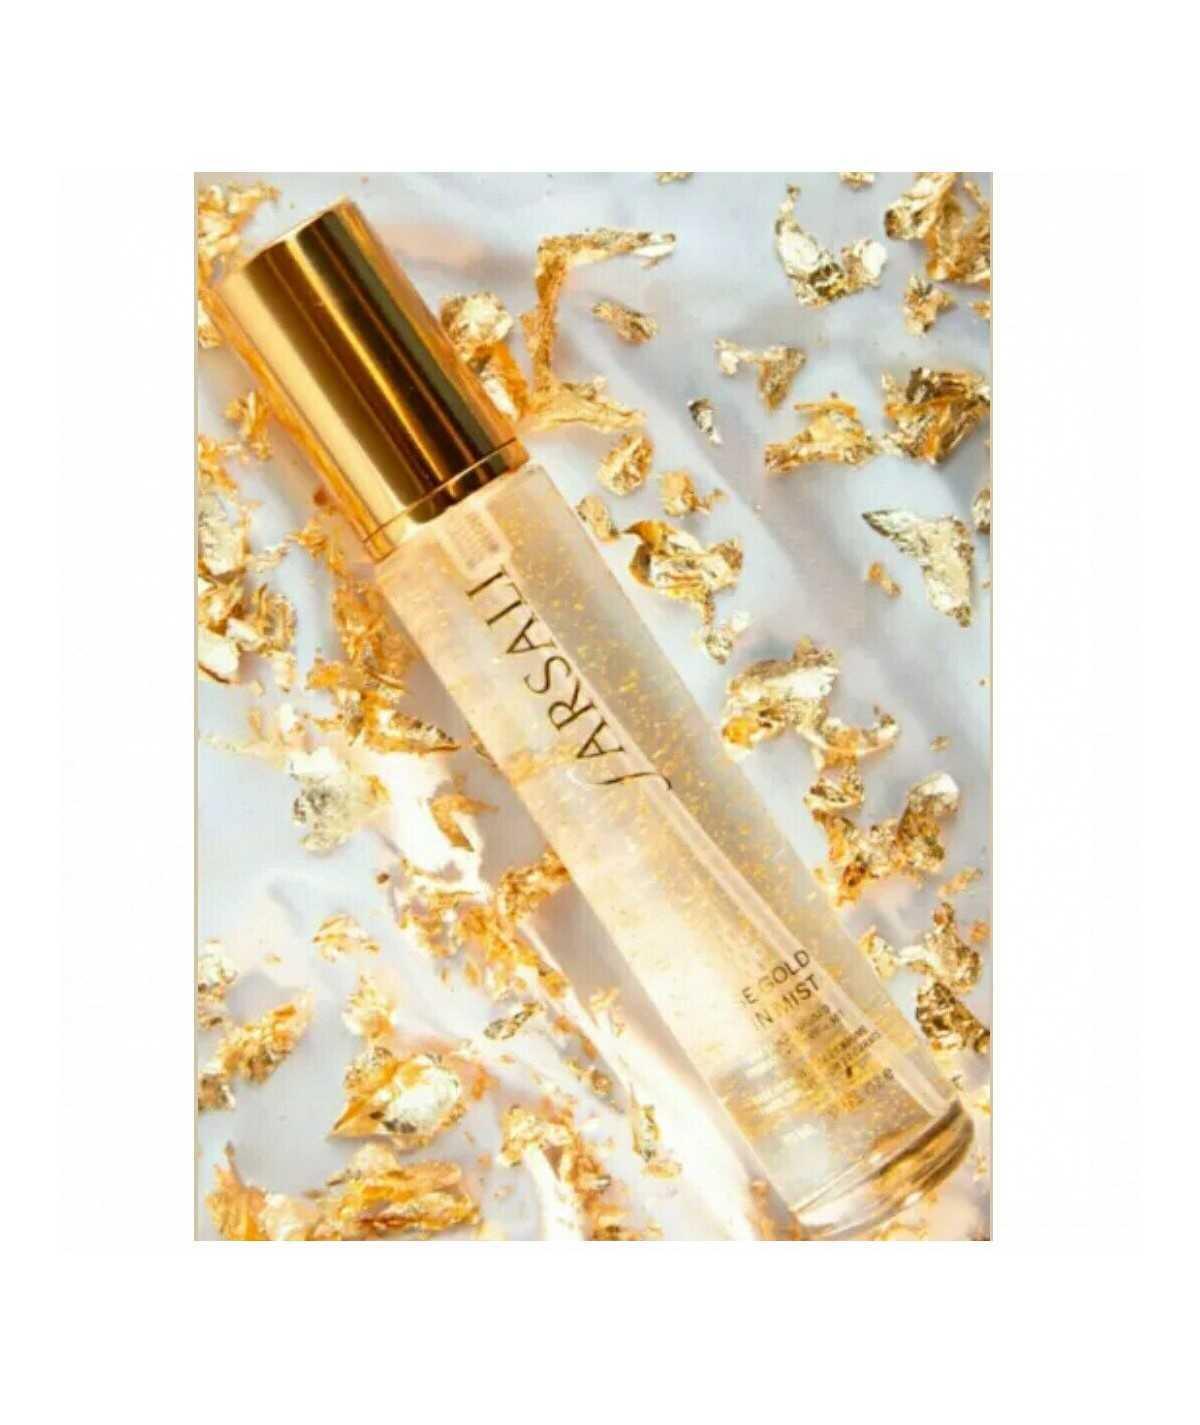 FARSÁLI Rose Gold 24K Skin Mist